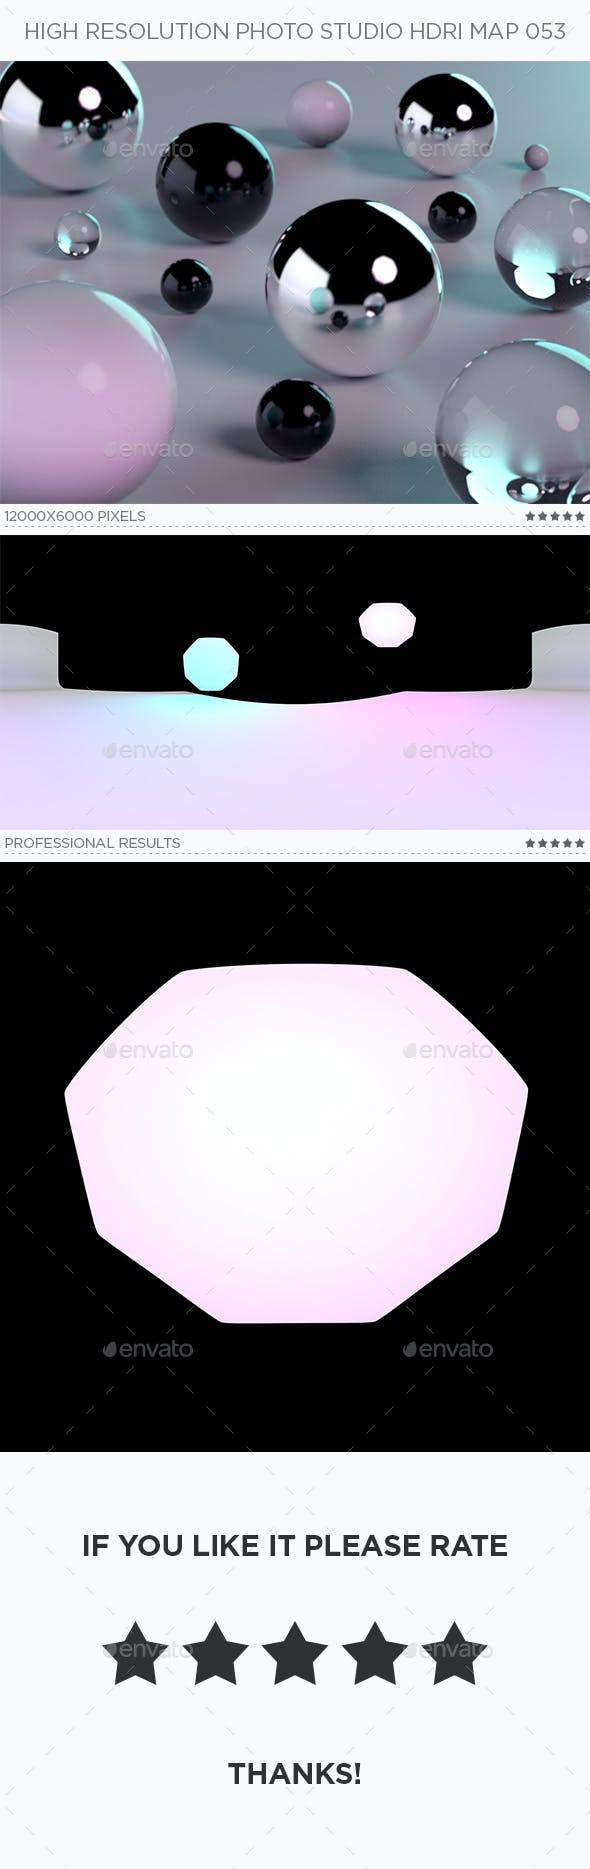 High Resolution Photo Studio HDRi Map 053 - 3DOcean Item for Sale